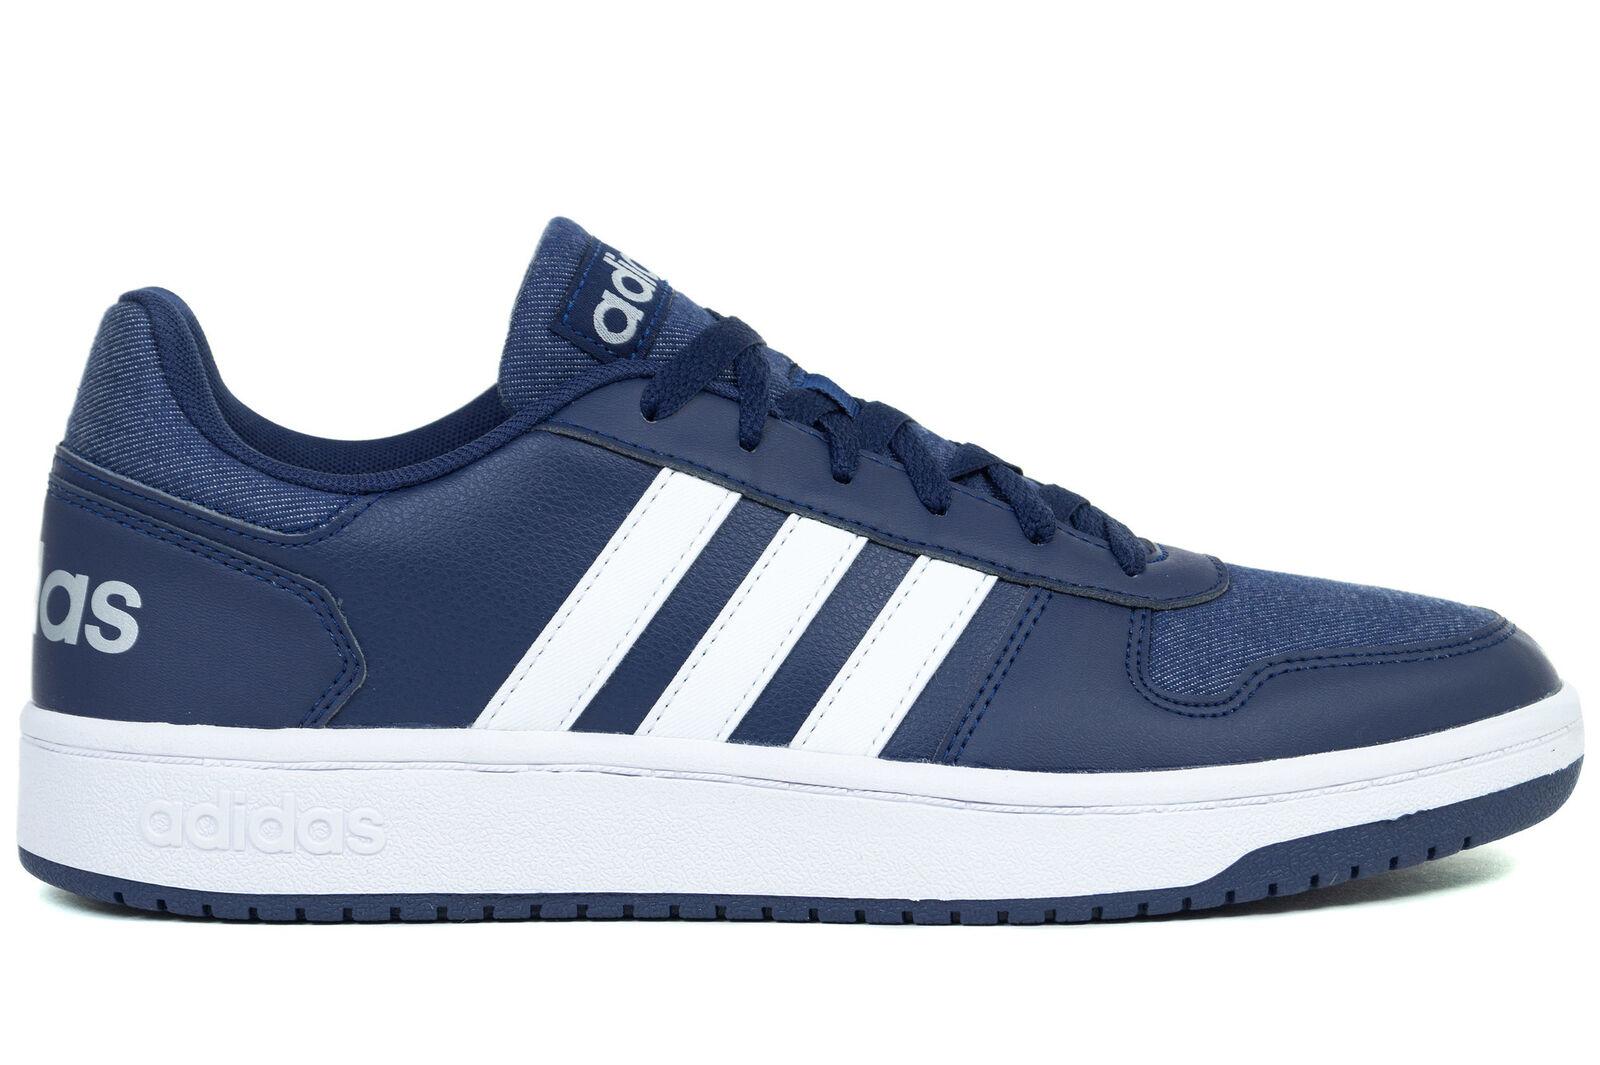 Adidas Hoops 2.0 Men's Walking shoes Sneakers Navy NEW F34856